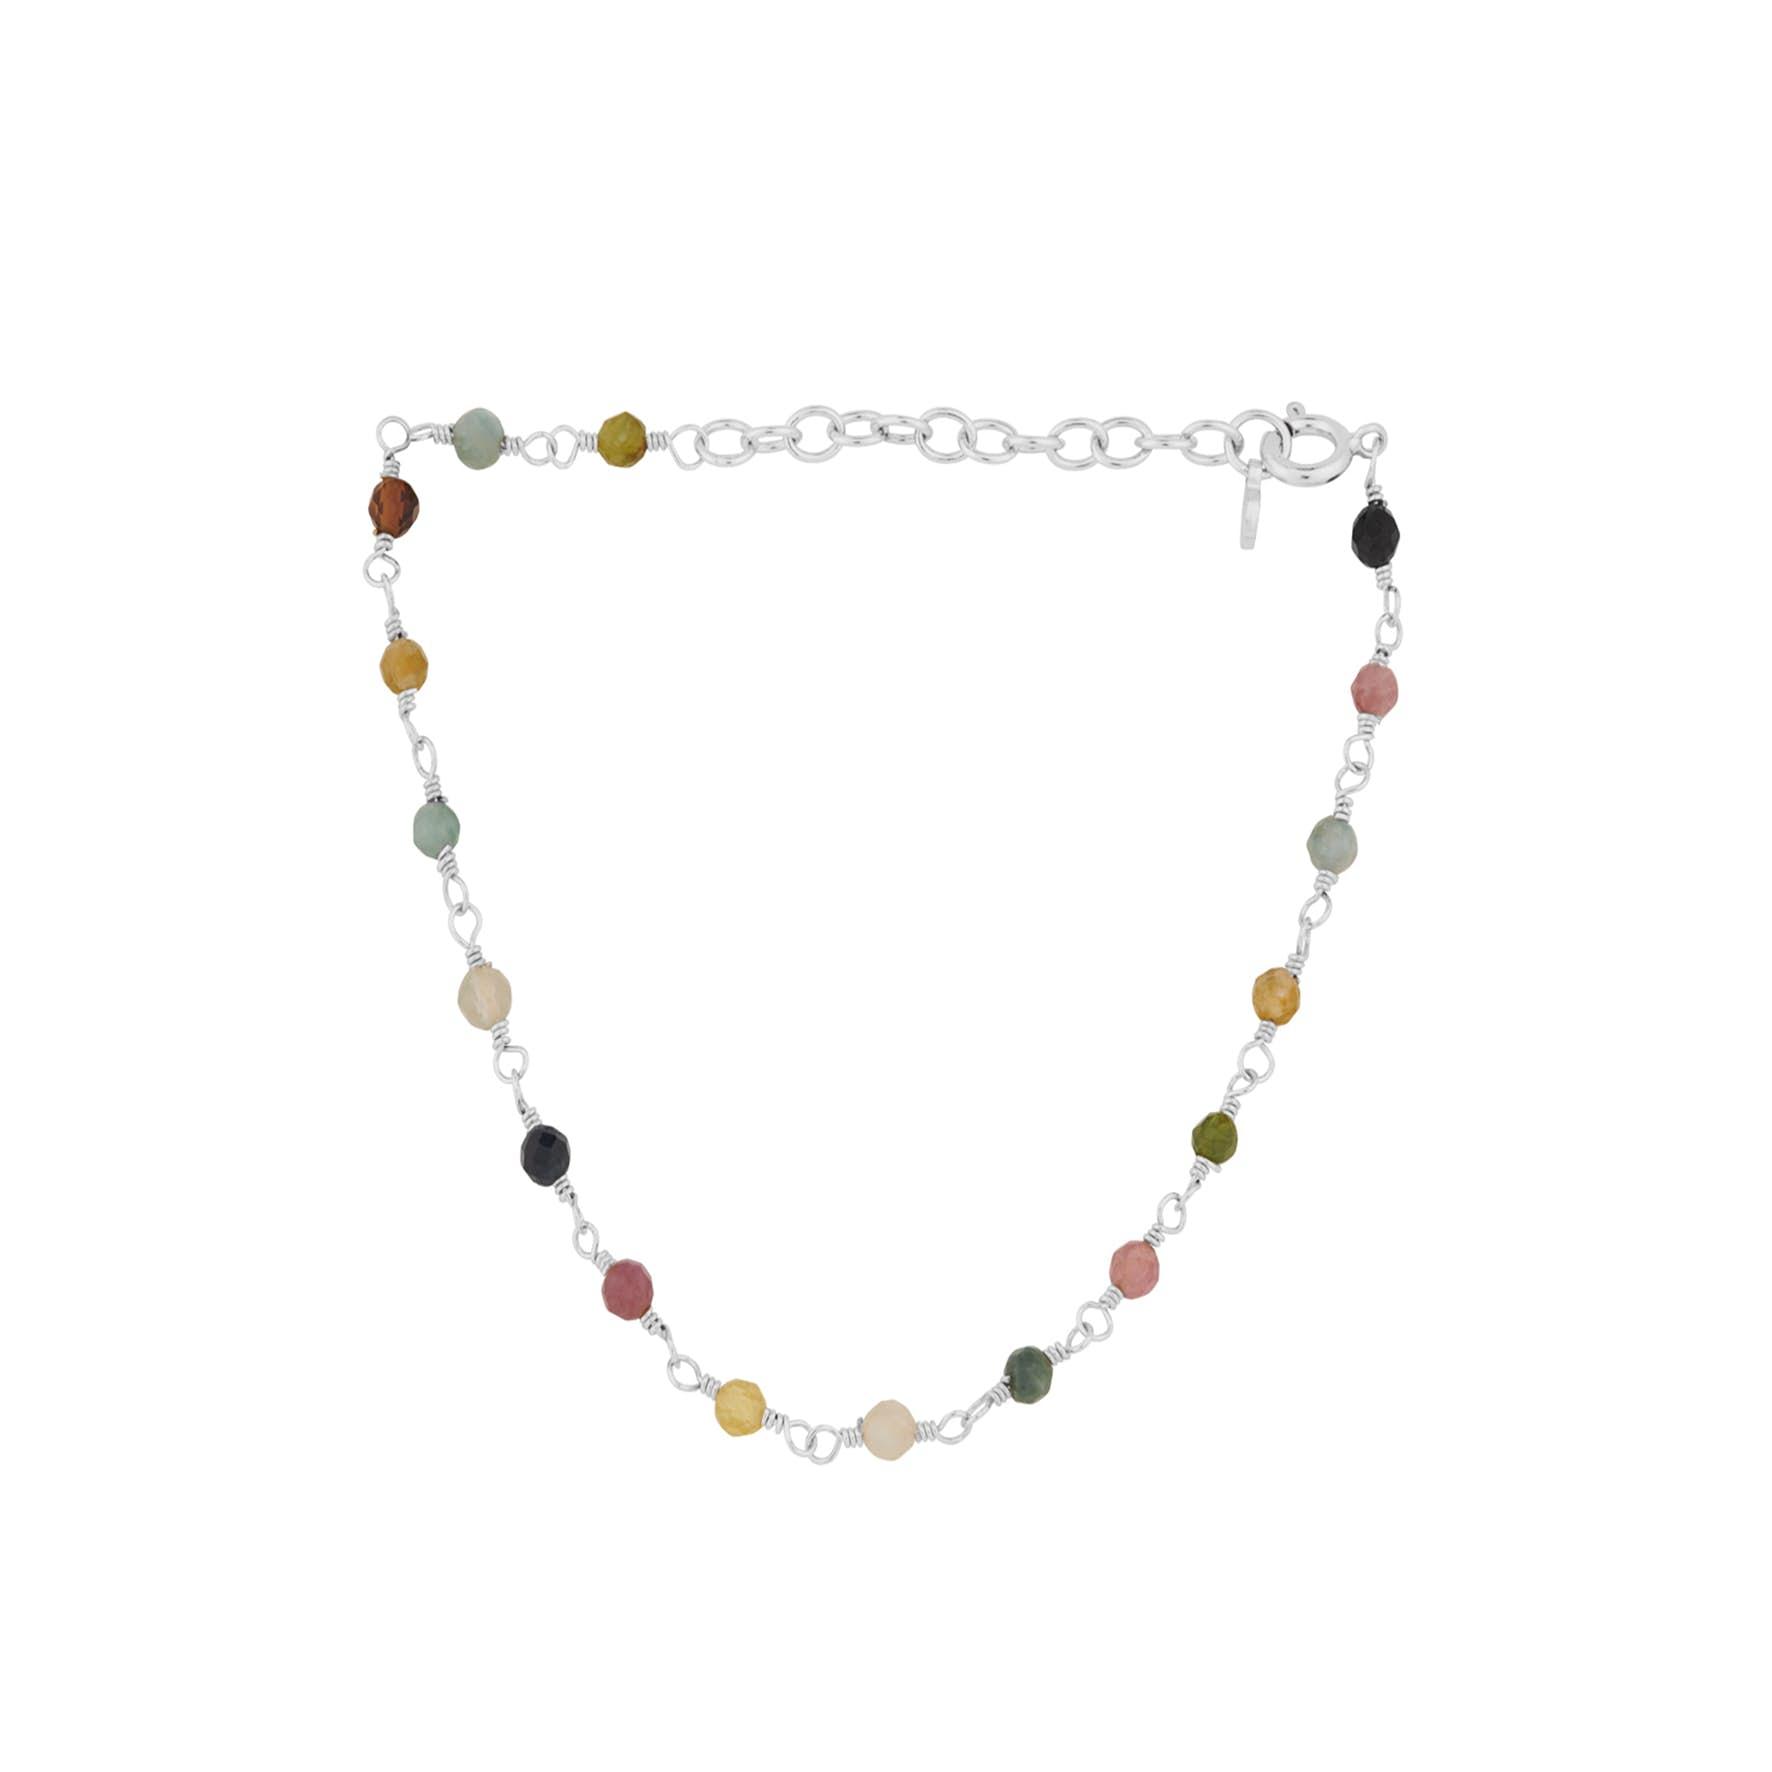 Shade Bracelet von Pernille Corydon in Silber Sterling 925 Blank